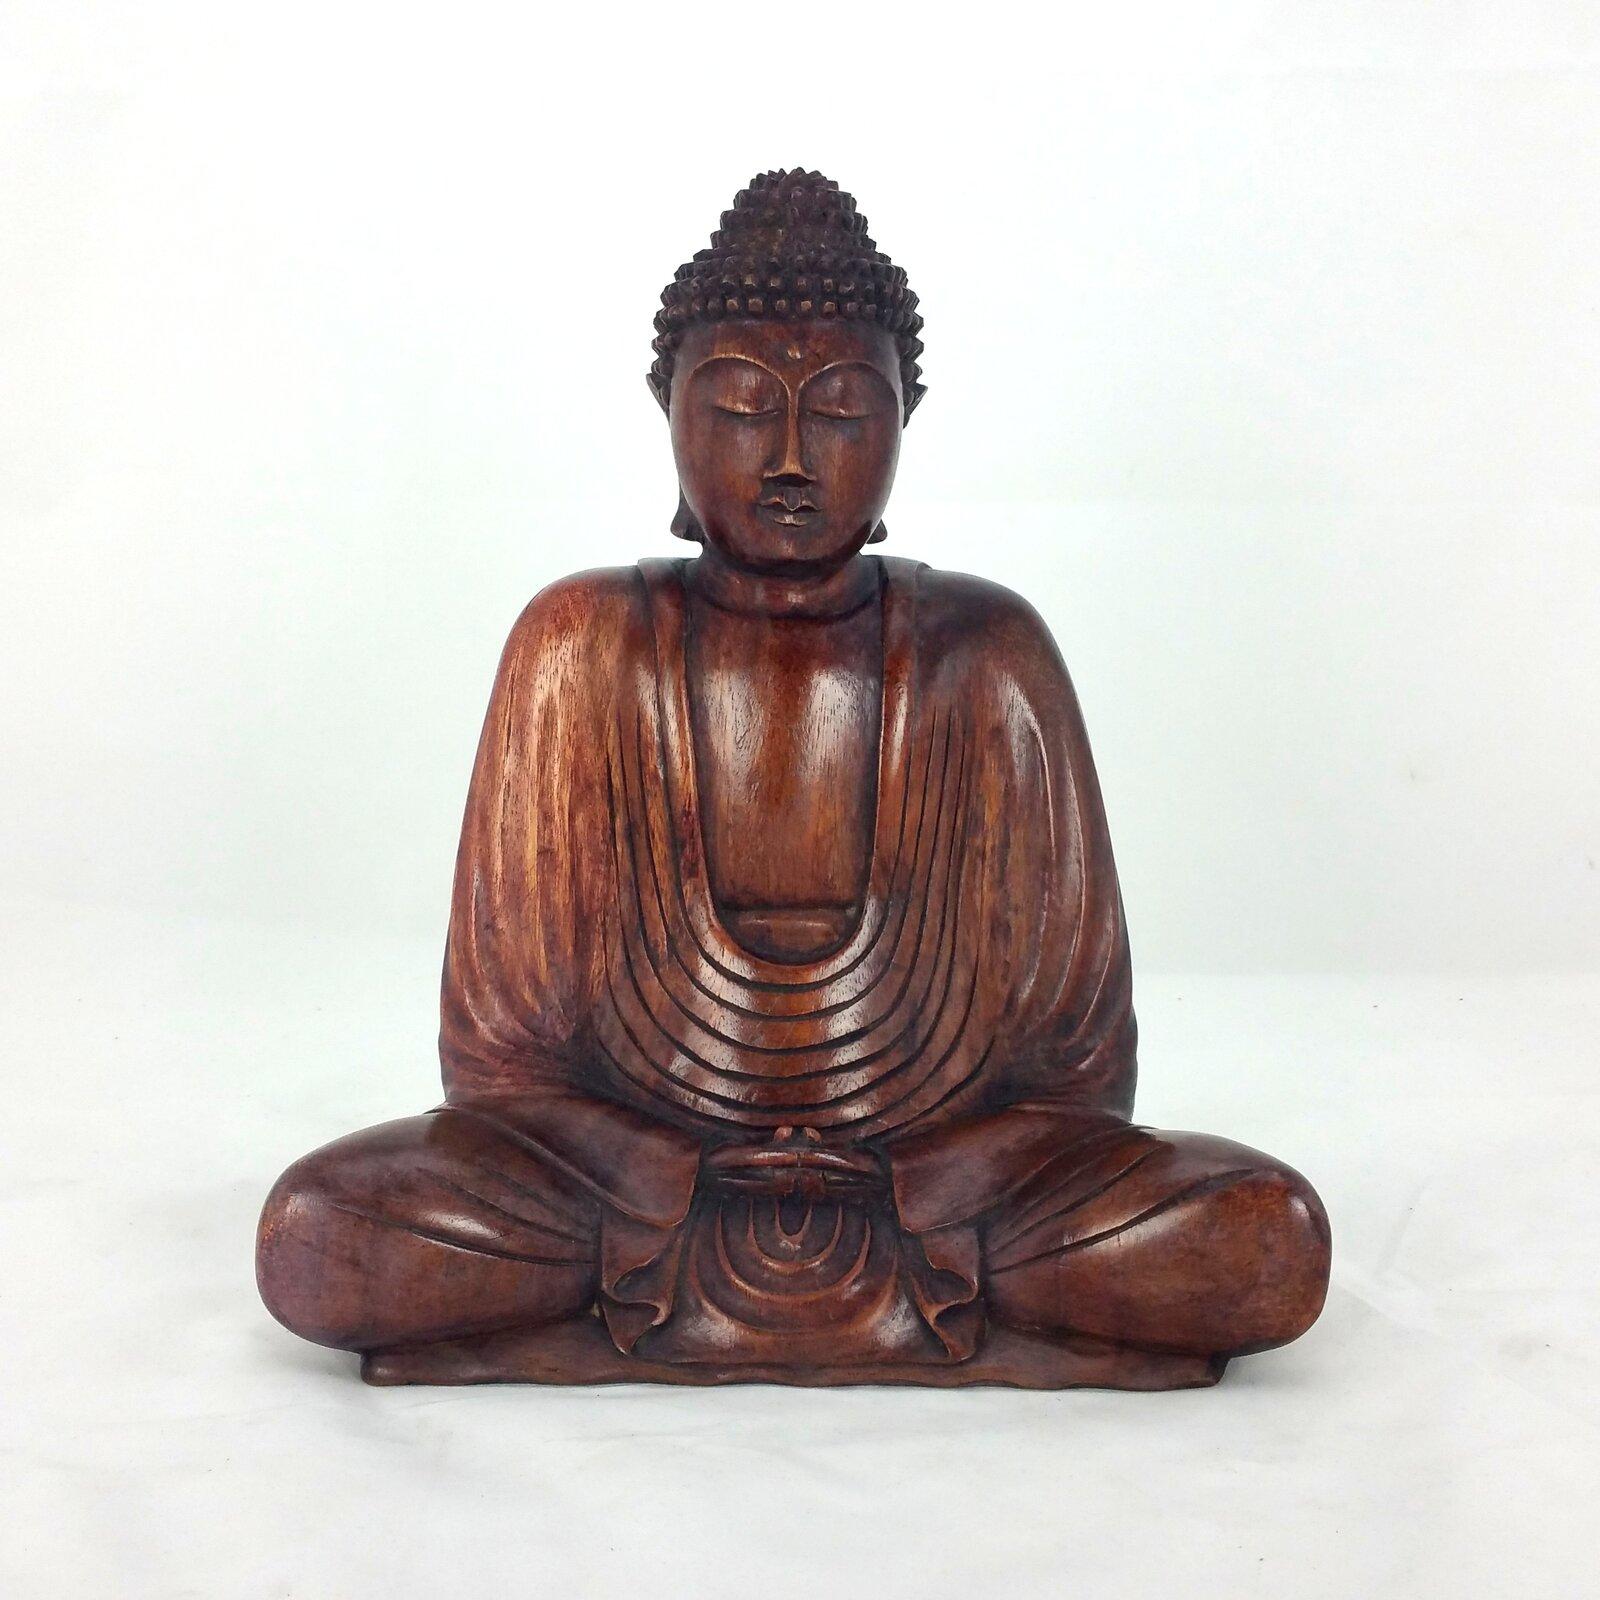 handmade-wooden-buddha-statue-mahogany-sculpture-thoughtful-gift-idea-for-buddhist-decoration-ideas-for-meditation-area